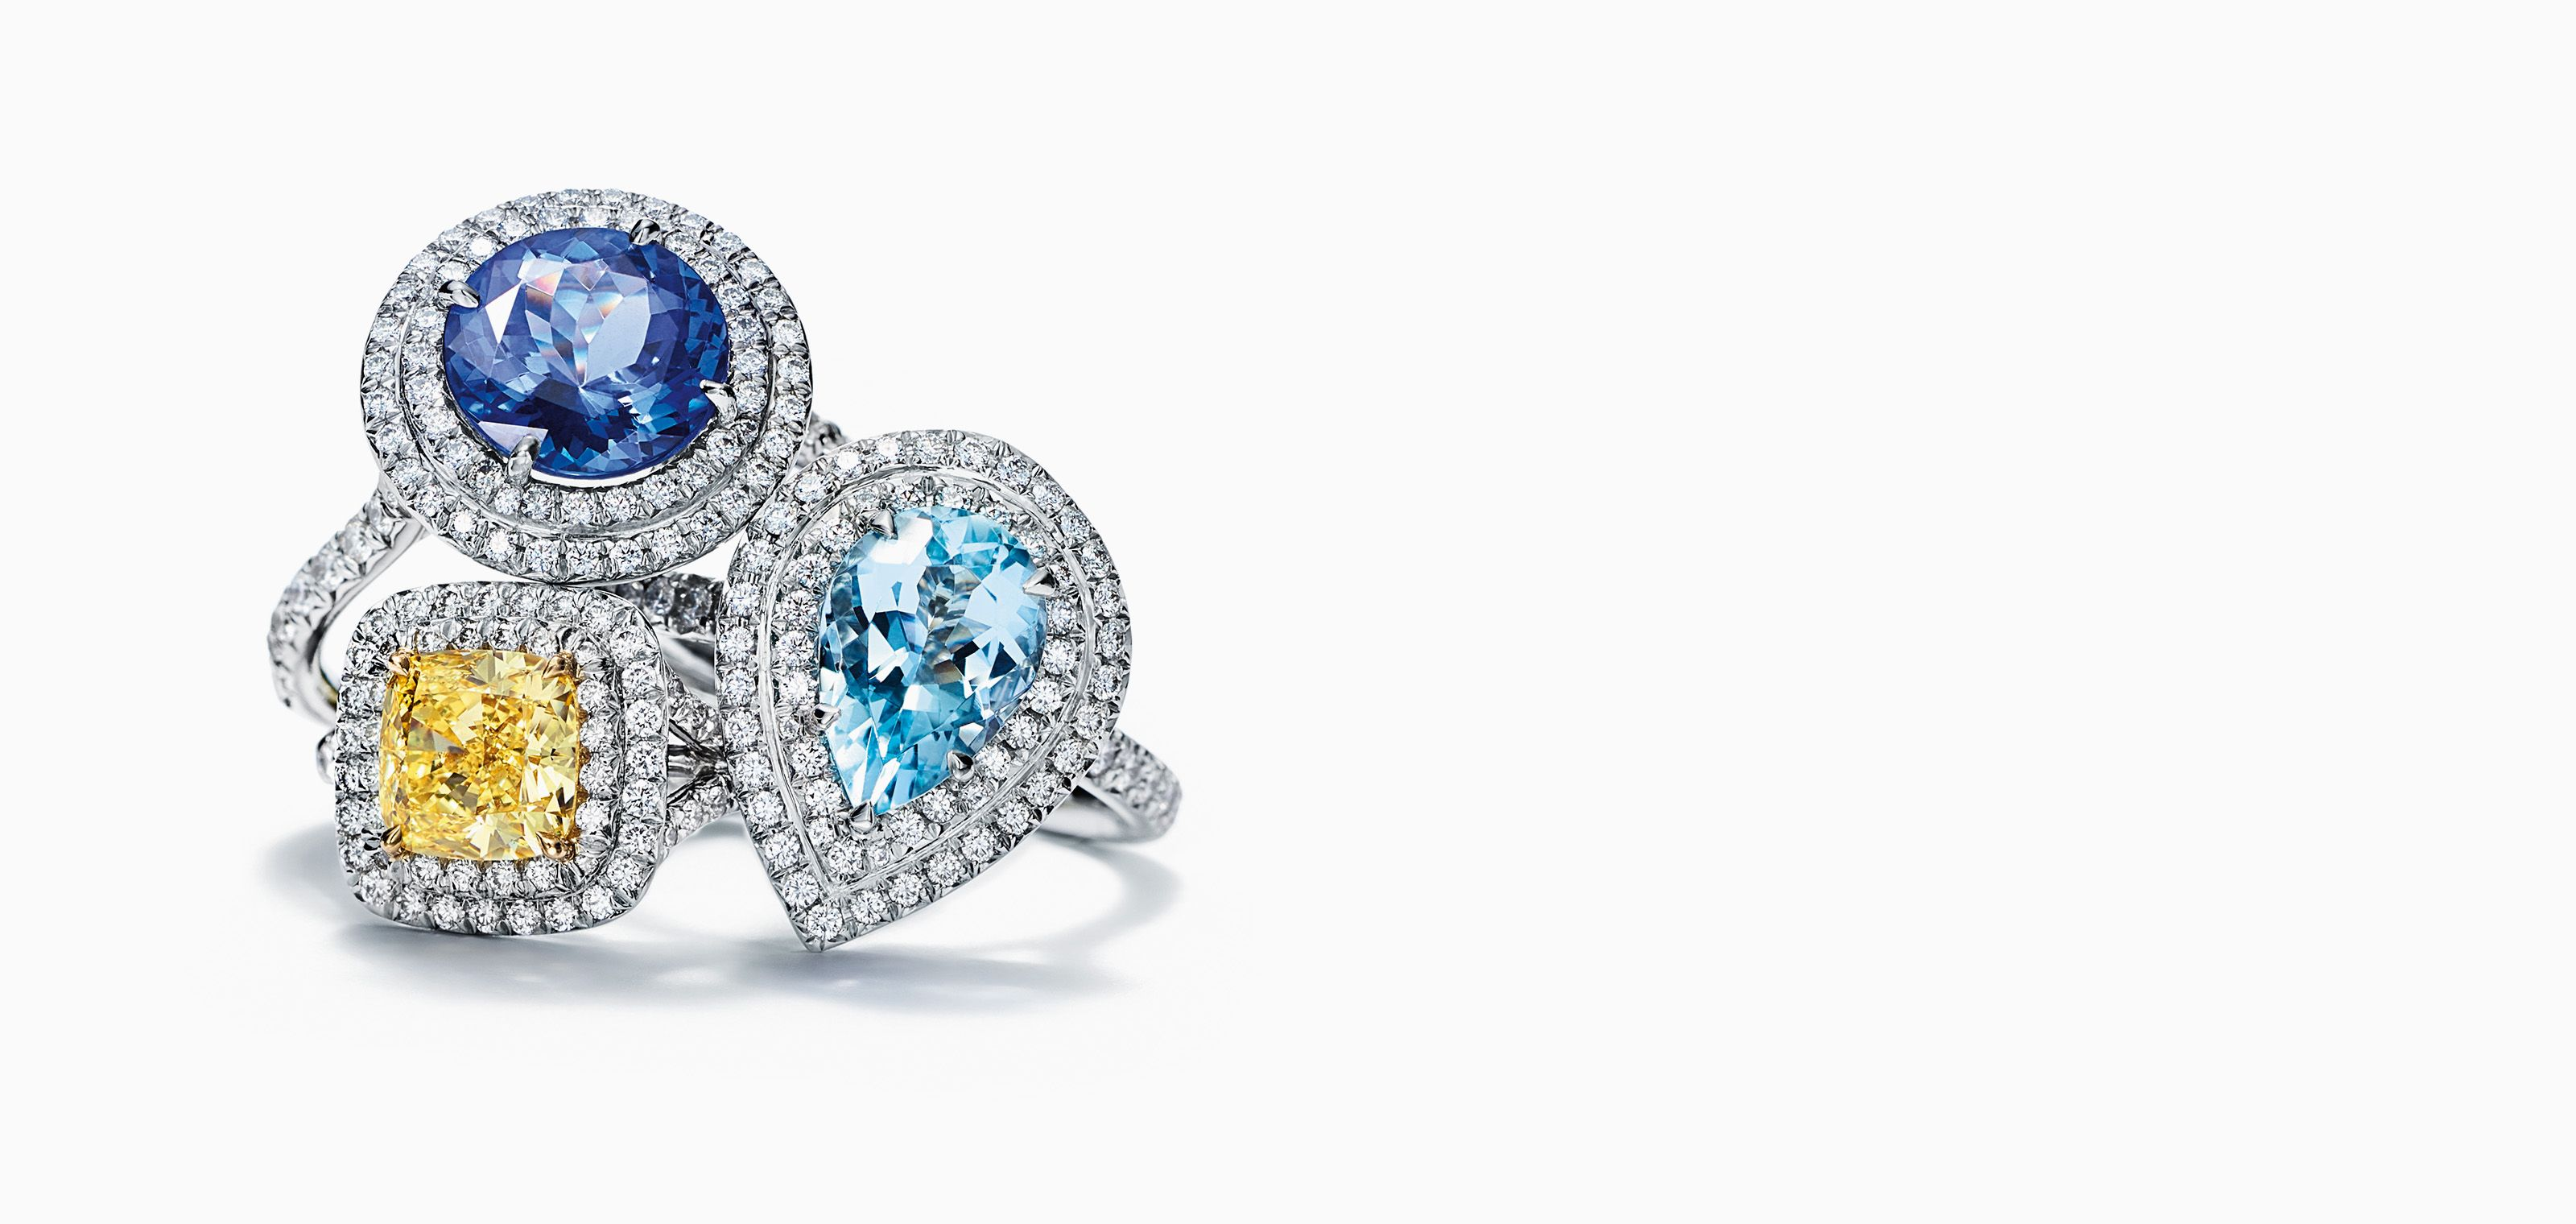 525aaec75 Tiffany Soleste® | Tiffany & Co.